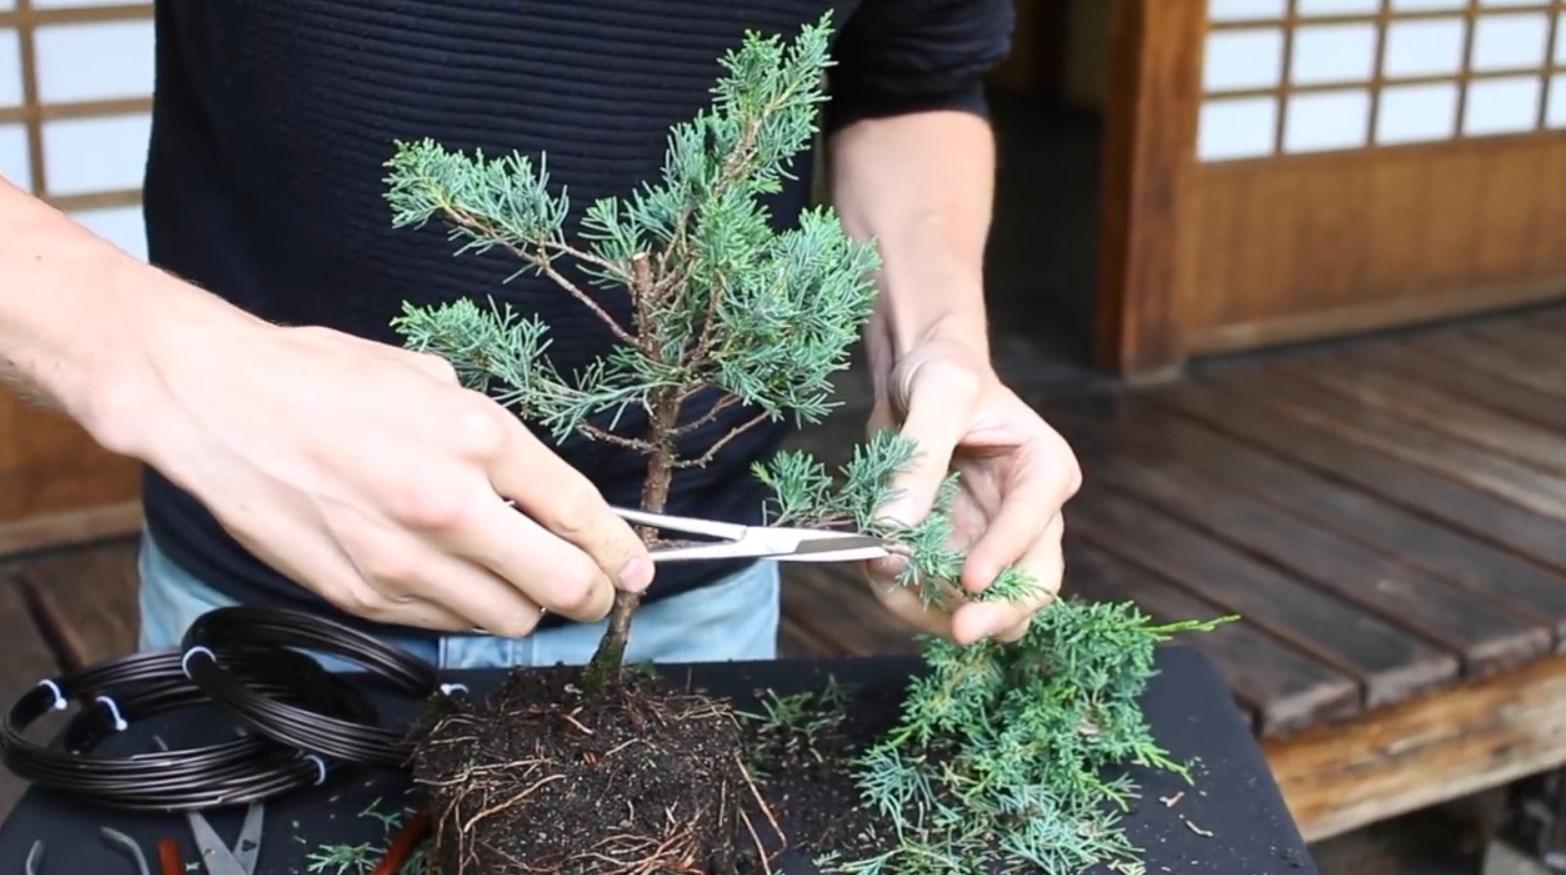 07.-Como-crear-un-bonsai-de-enebro-eliminacion-ramas-bajas.jpg